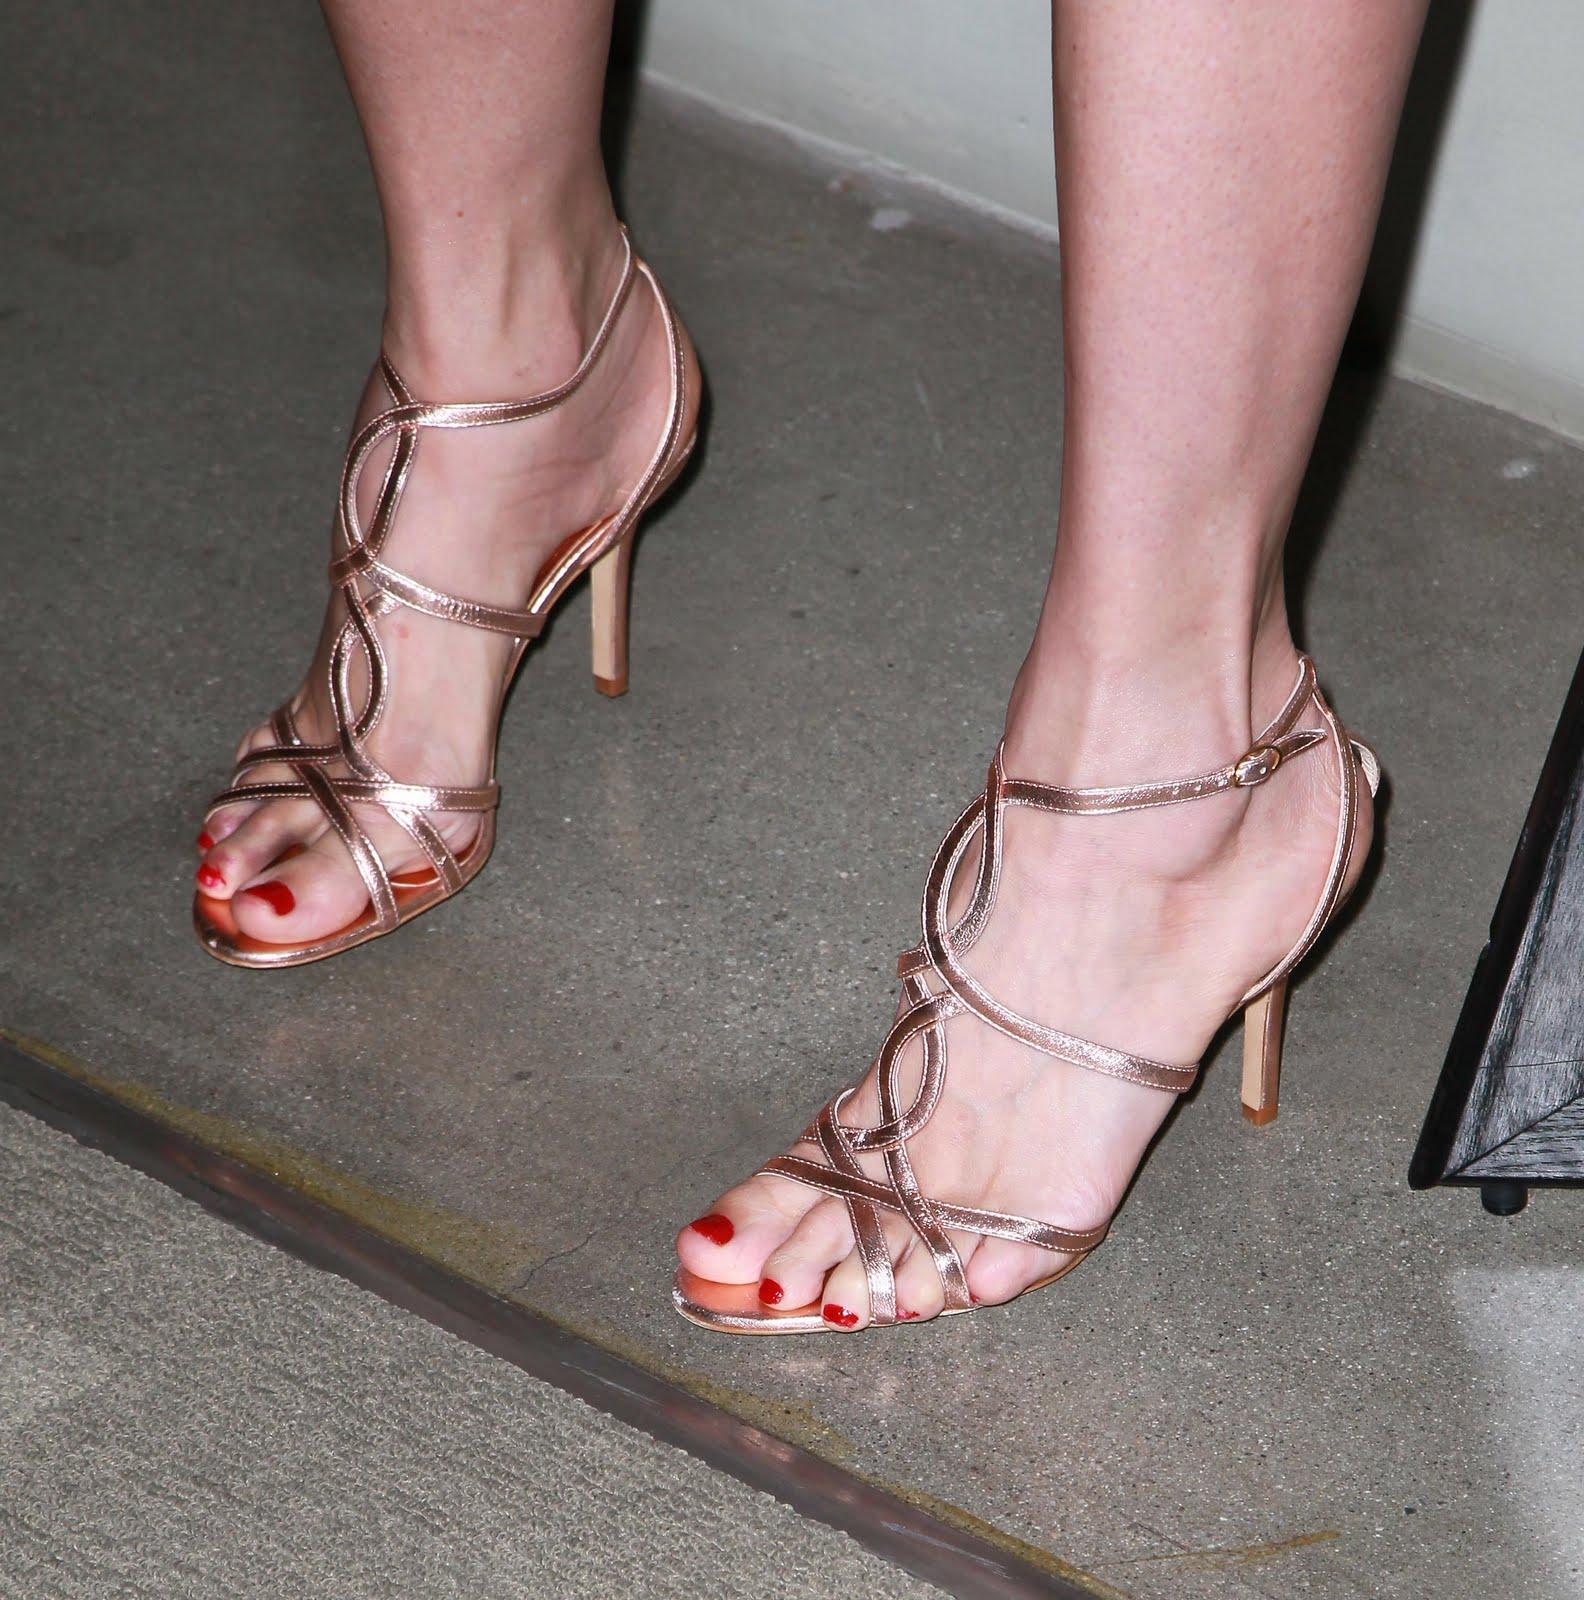 http://4.bp.blogspot.com/_bQ0SqifjNcg/TFEZFiSqtRI/AAAAAAAAZuU/oAhdkEPLd1Y/s1600/mira-sorvino-feet.jpg